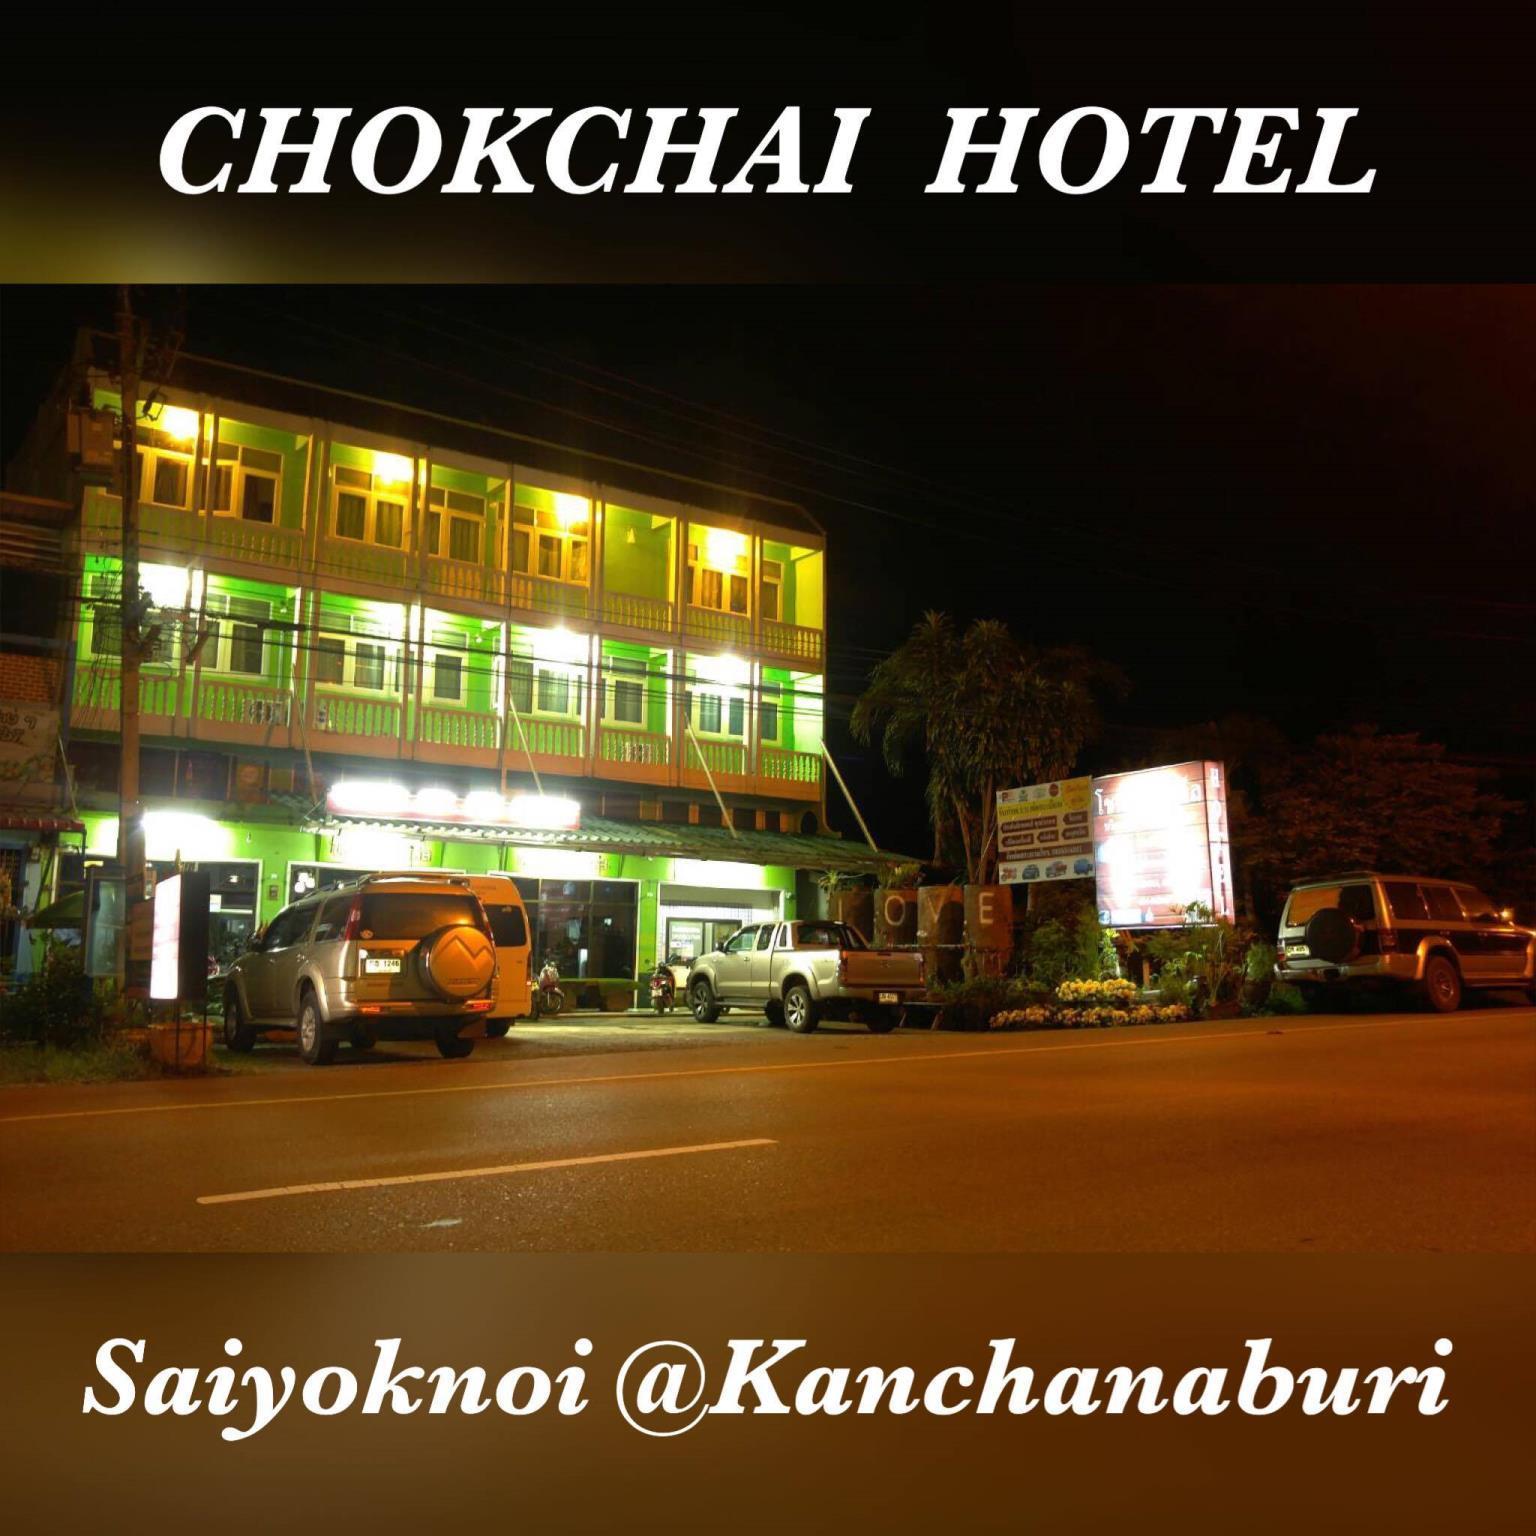 Chokchai Hotel